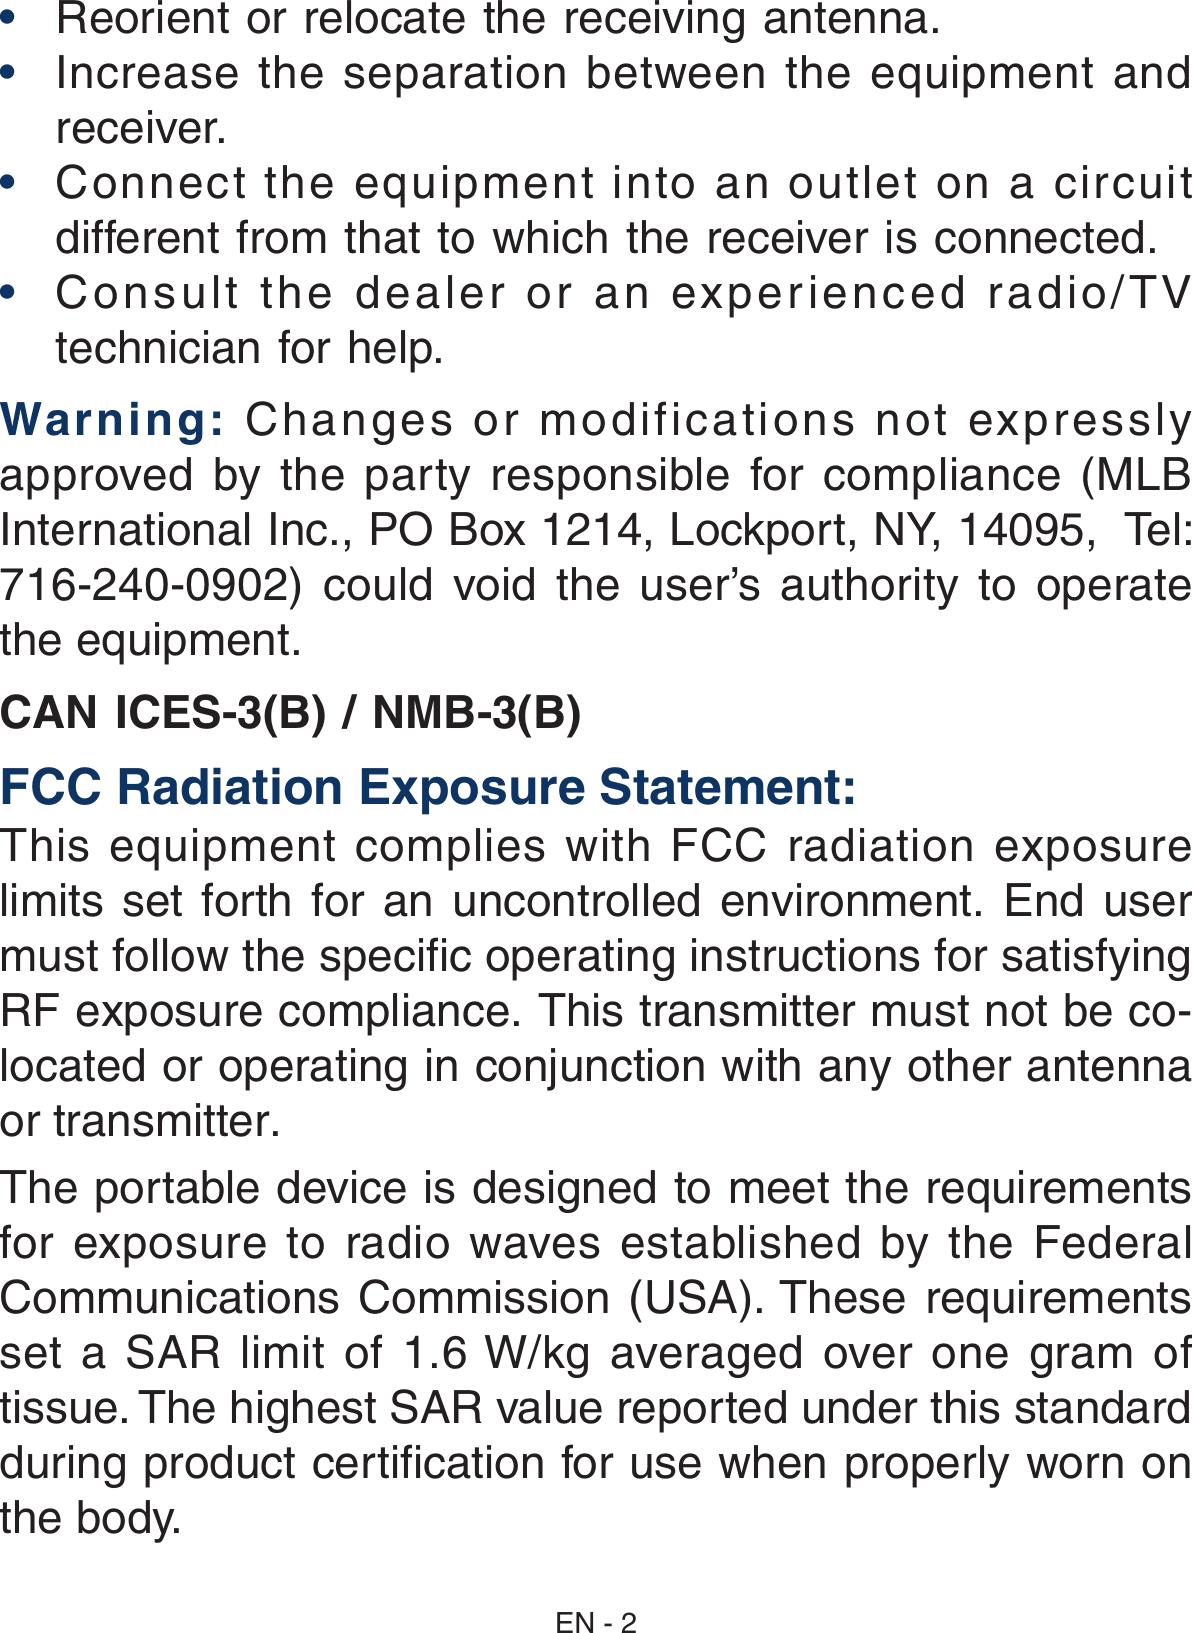 RCA RCT6203W46 L User Manual To The B815aa90 735a 4ccd b23f